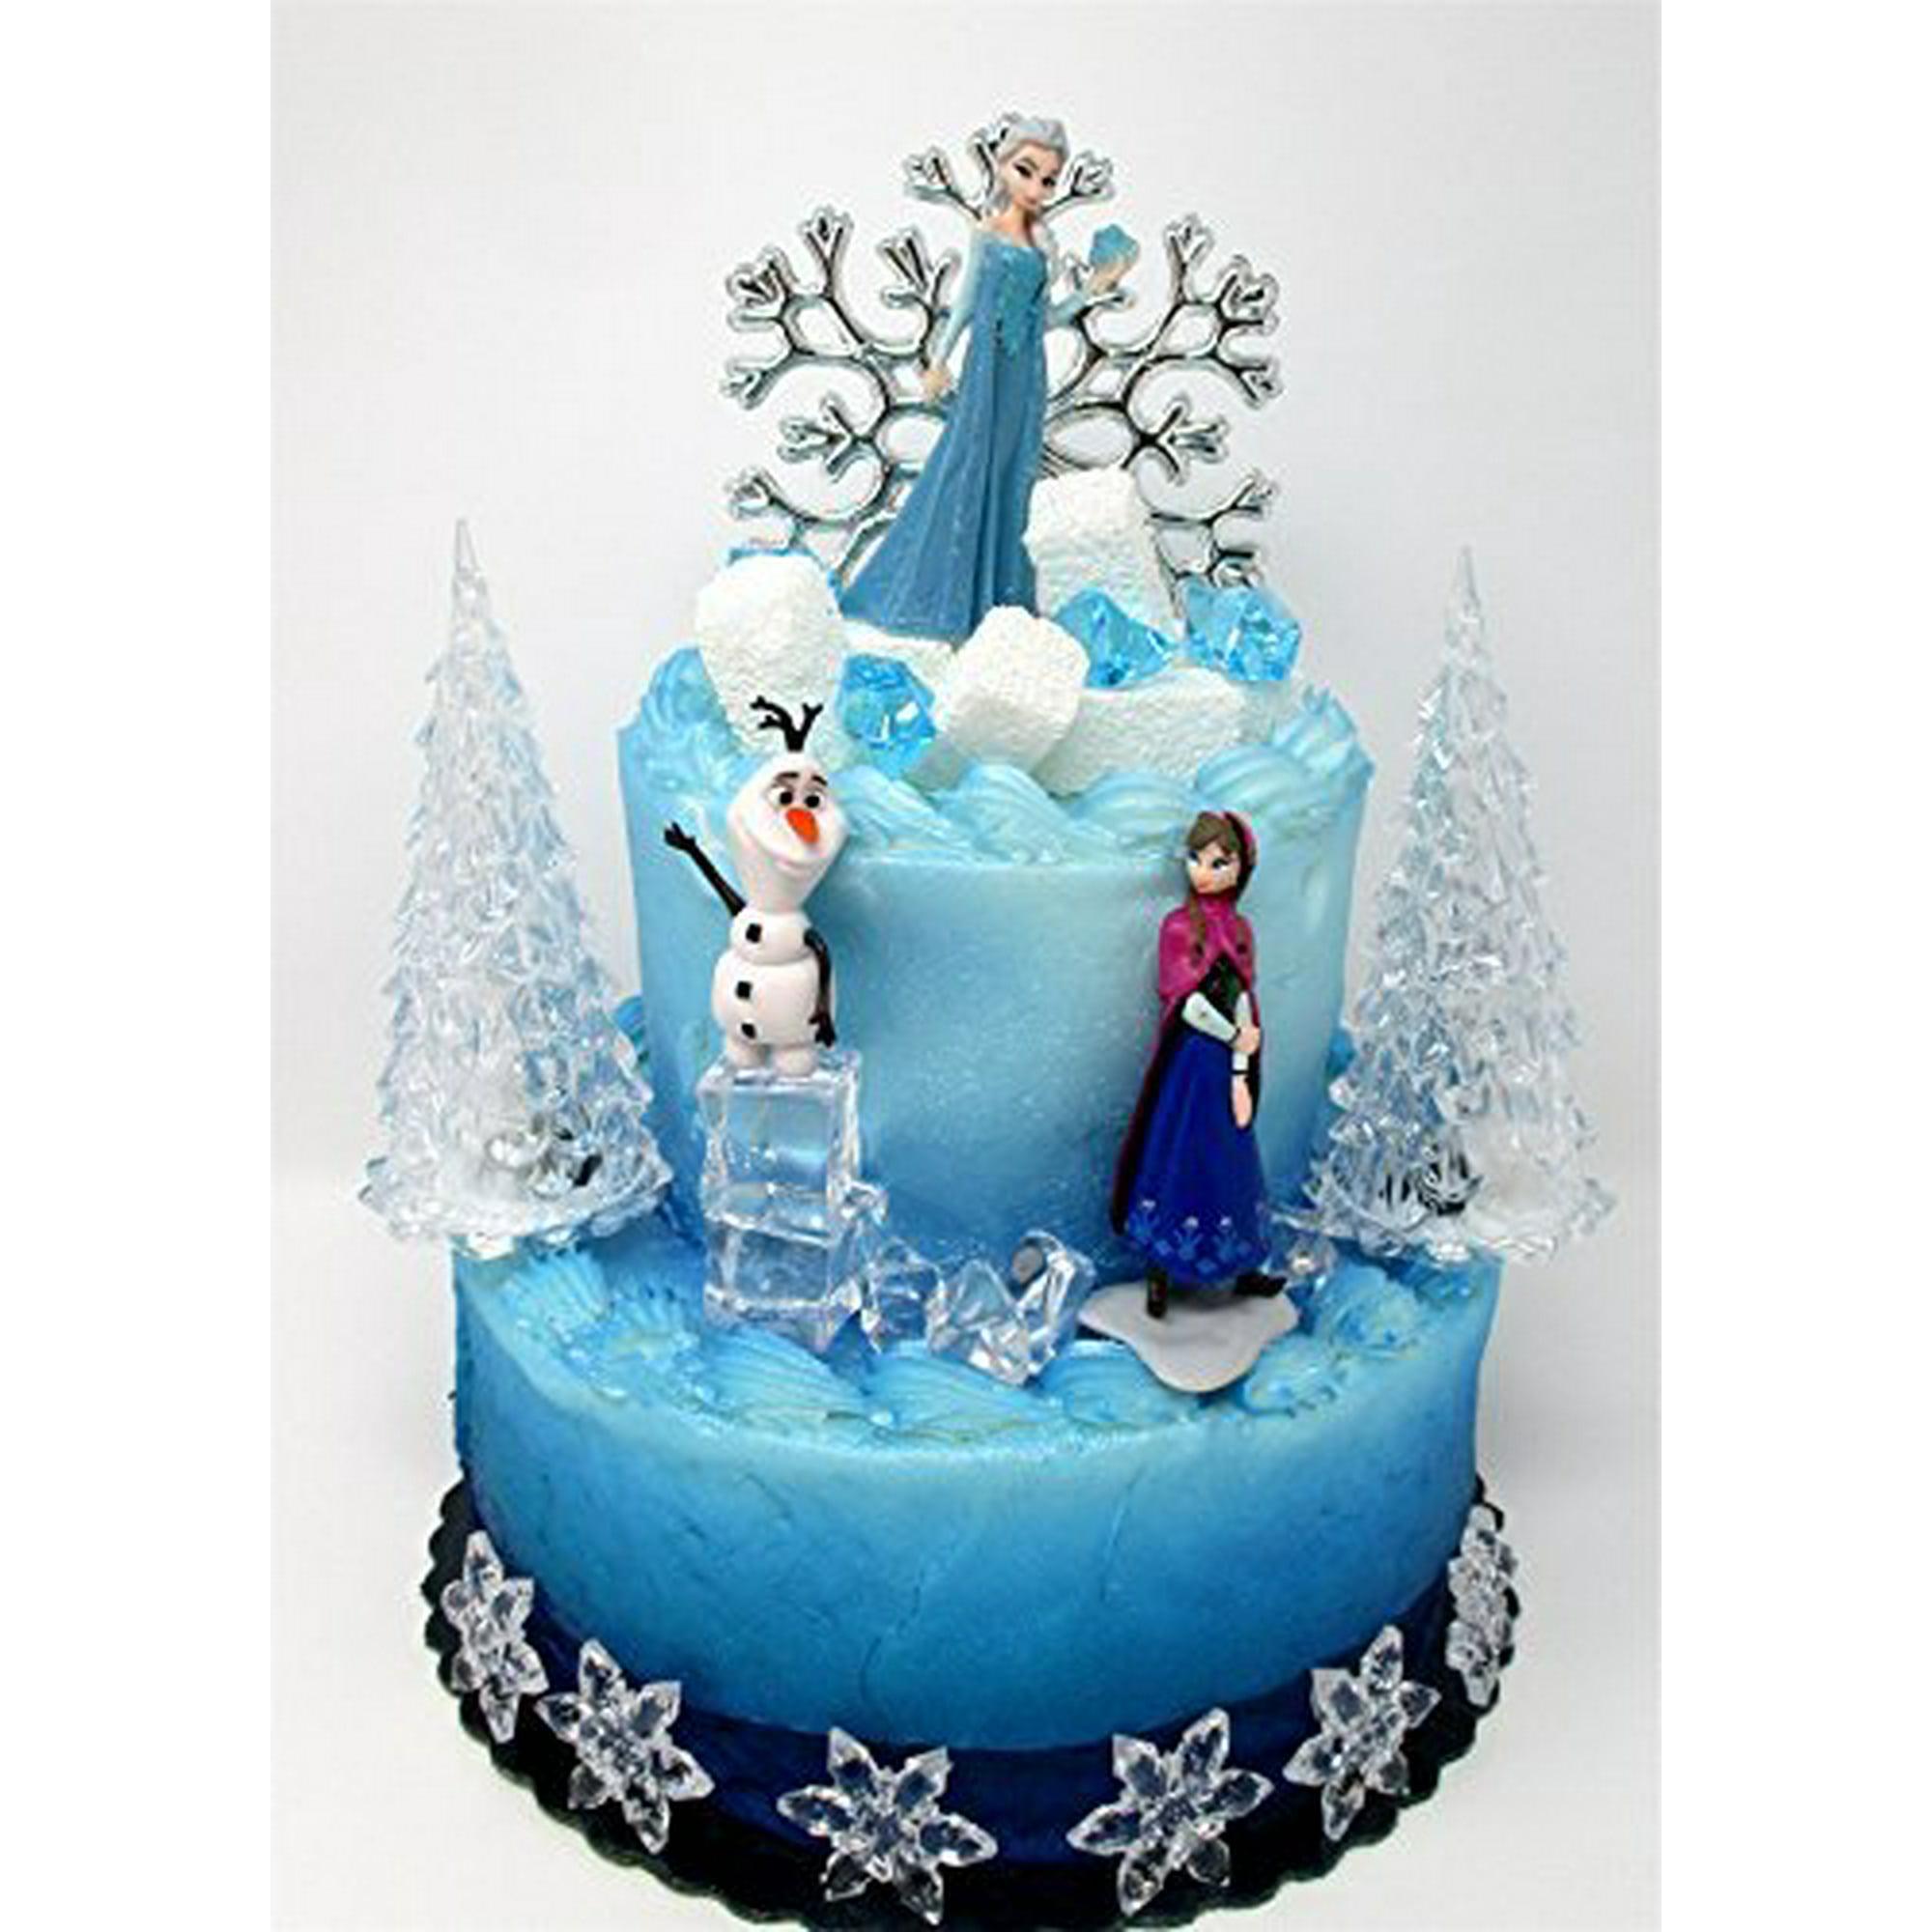 Enjoyable Winter Wonderland Princess Elsa Frozen Birthday Cake Topper Set Funny Birthday Cards Online Fluifree Goldxyz